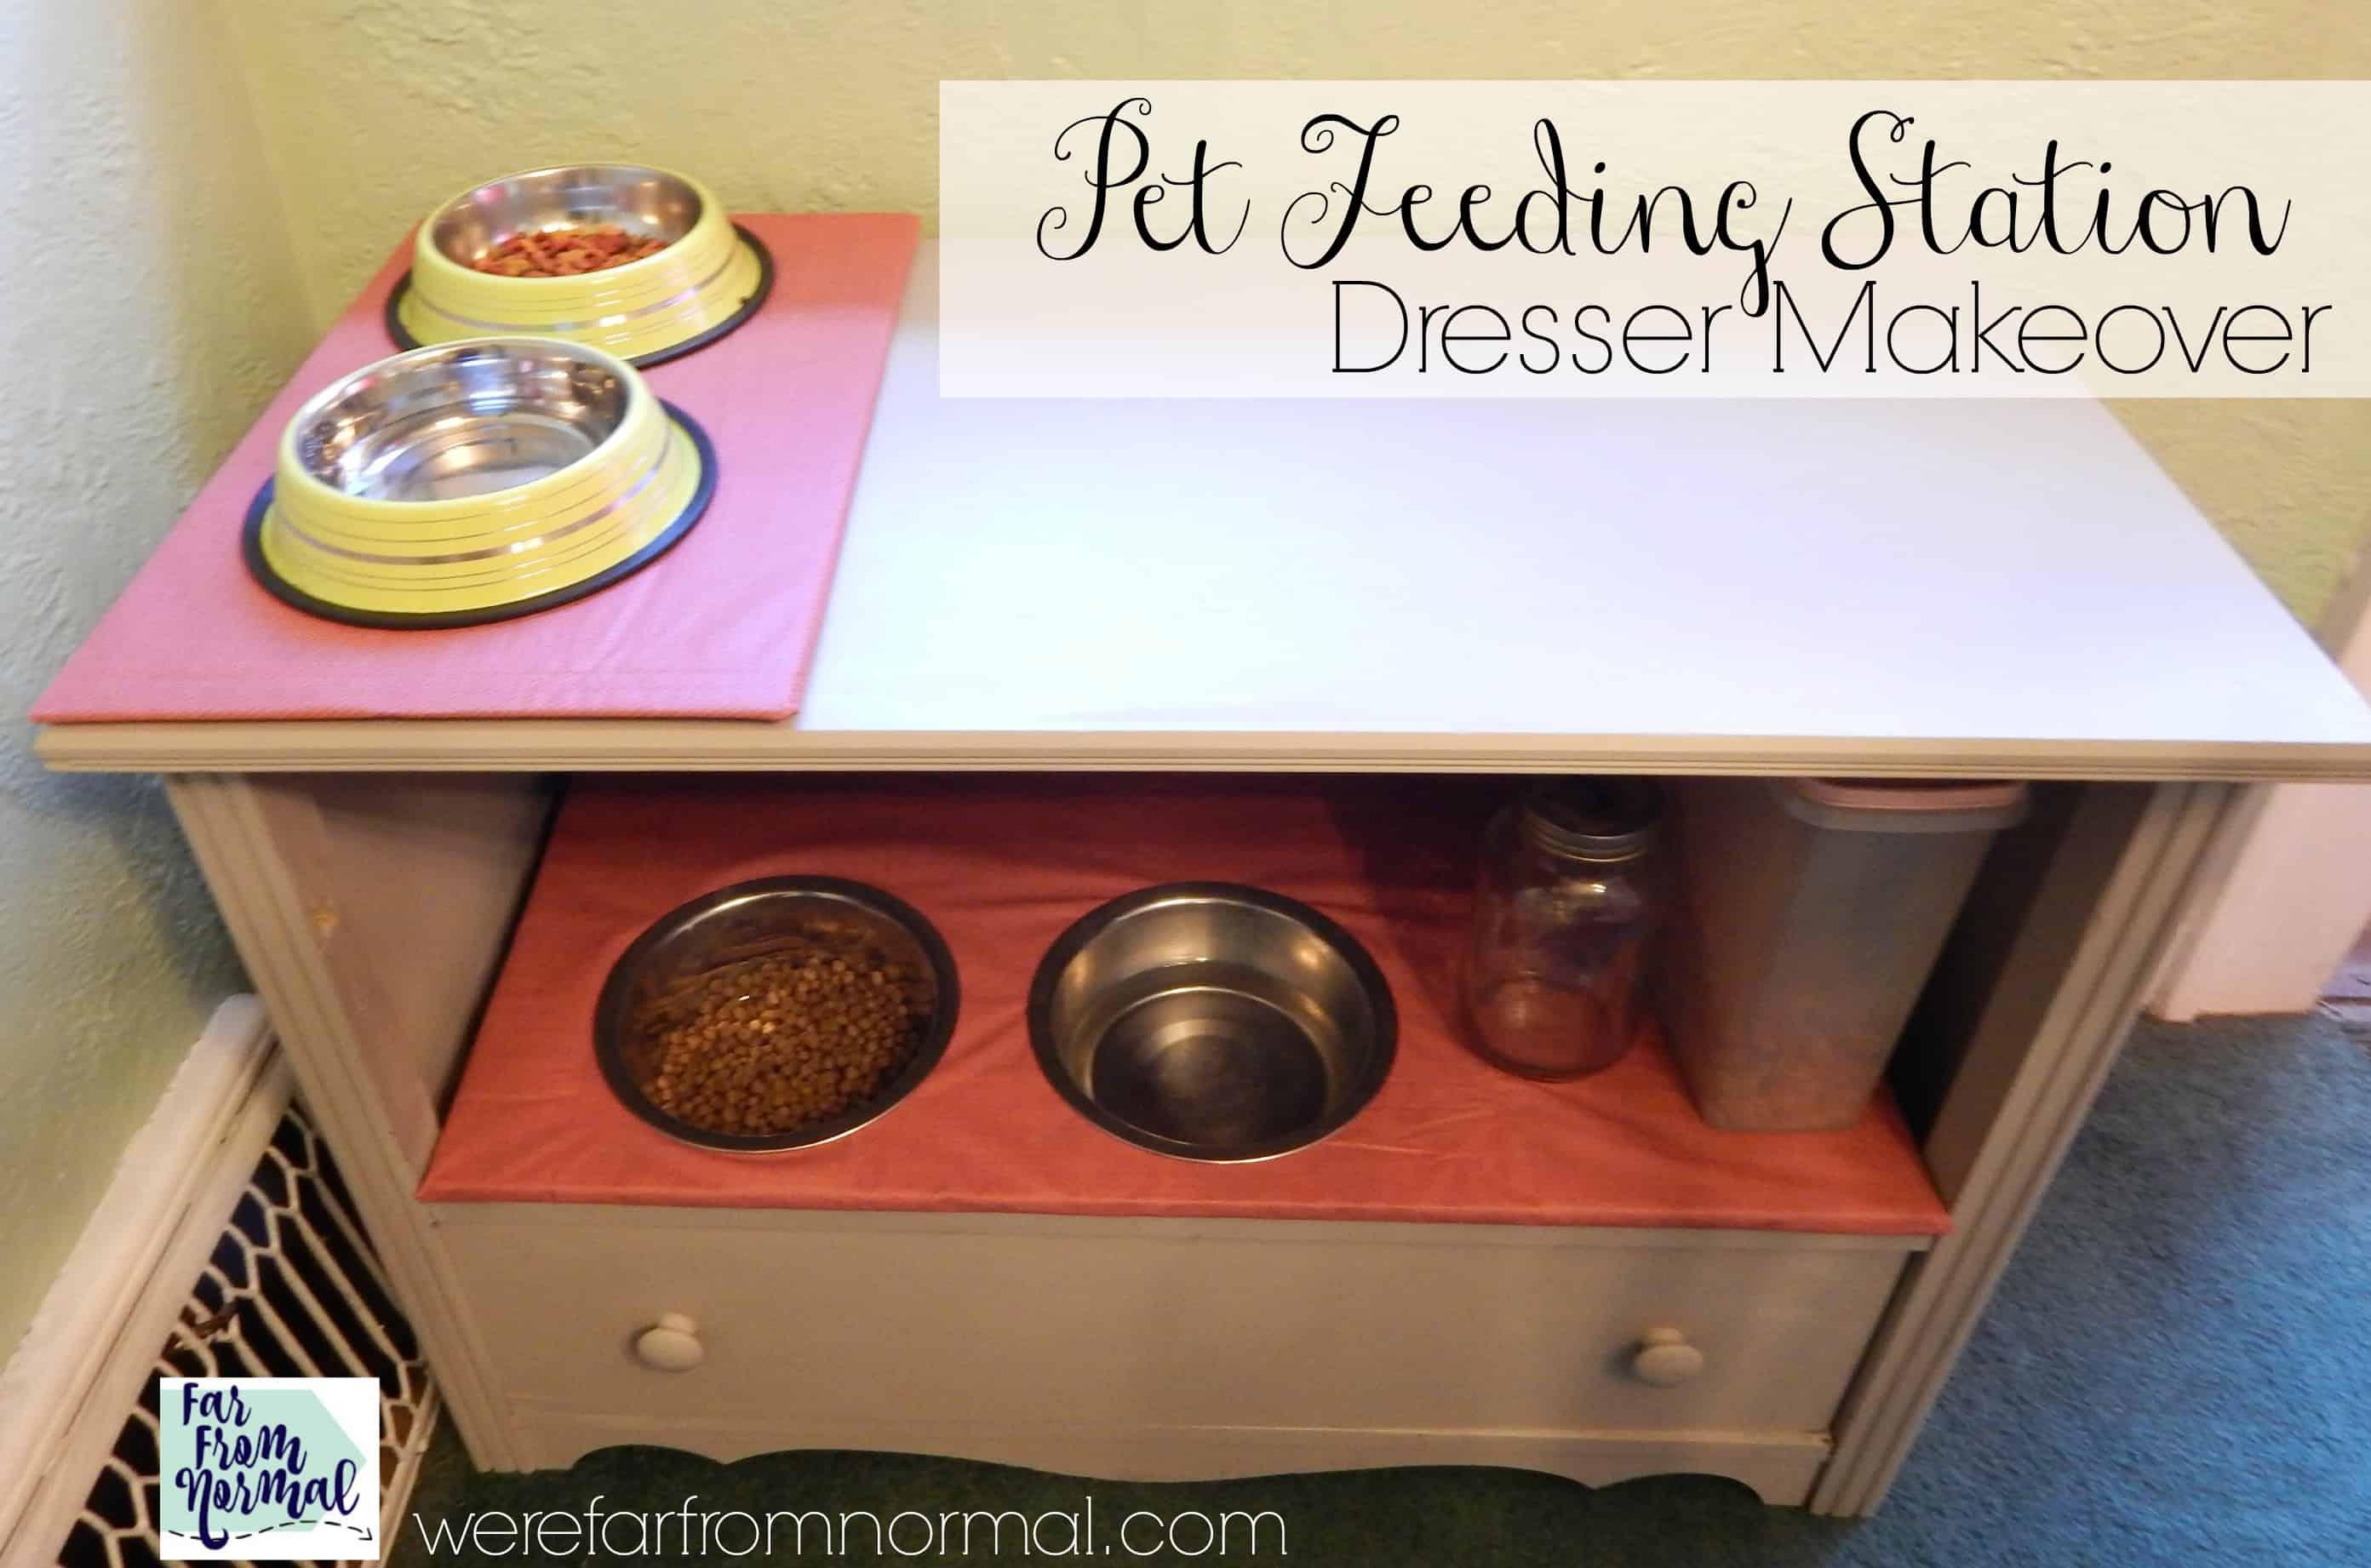 DIY Pet Feeding Station (Dresser Makeover)